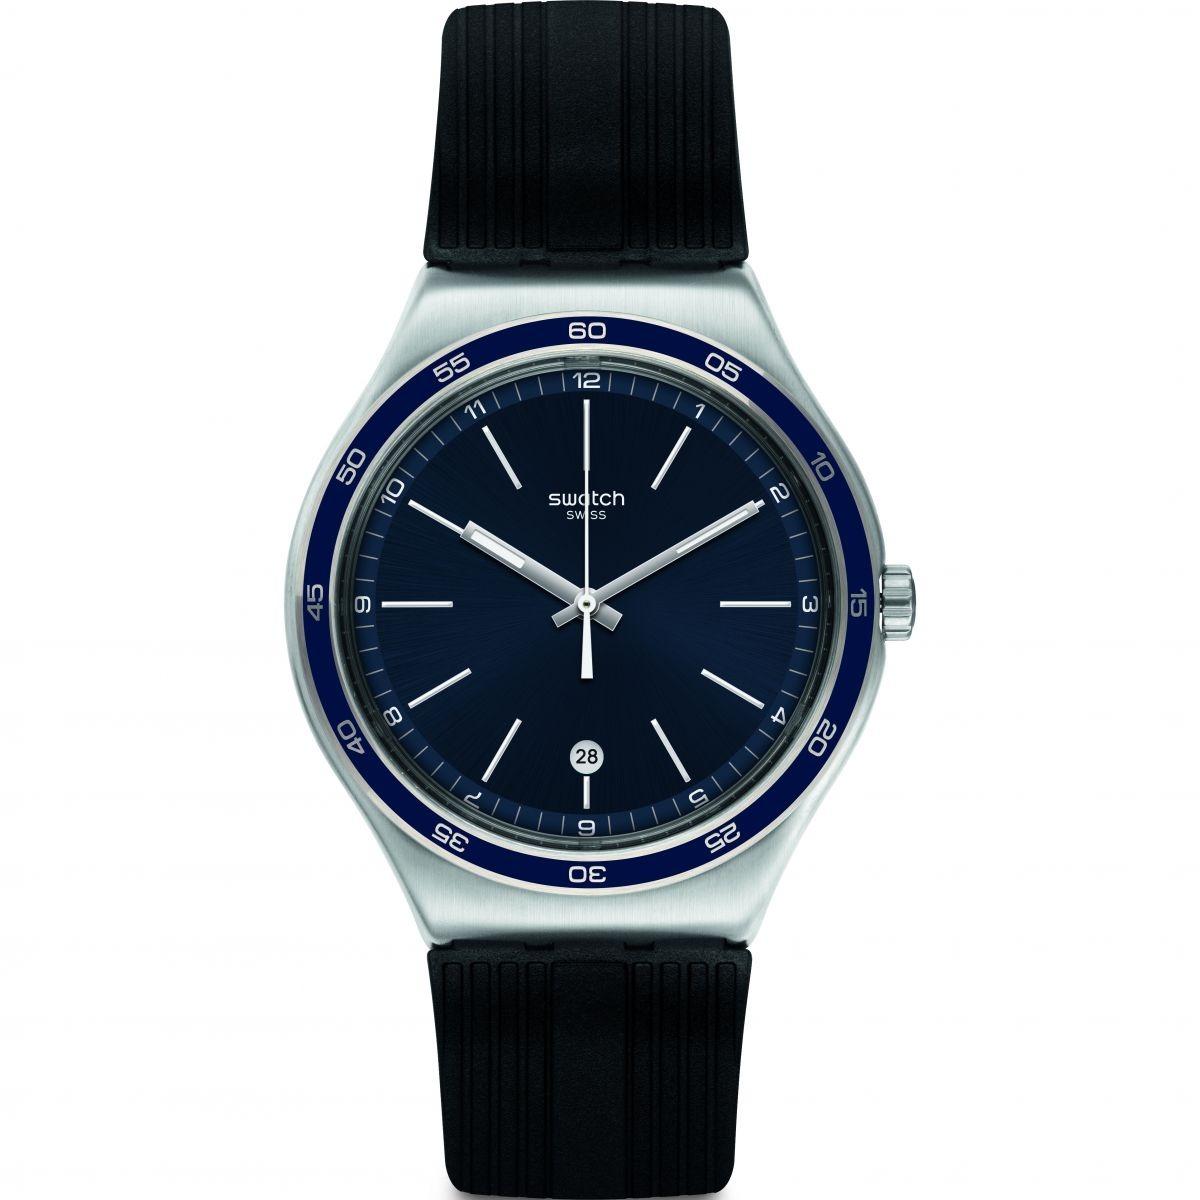 585aee82270 relógio swatch camarade - yws428. Carregando zoom.